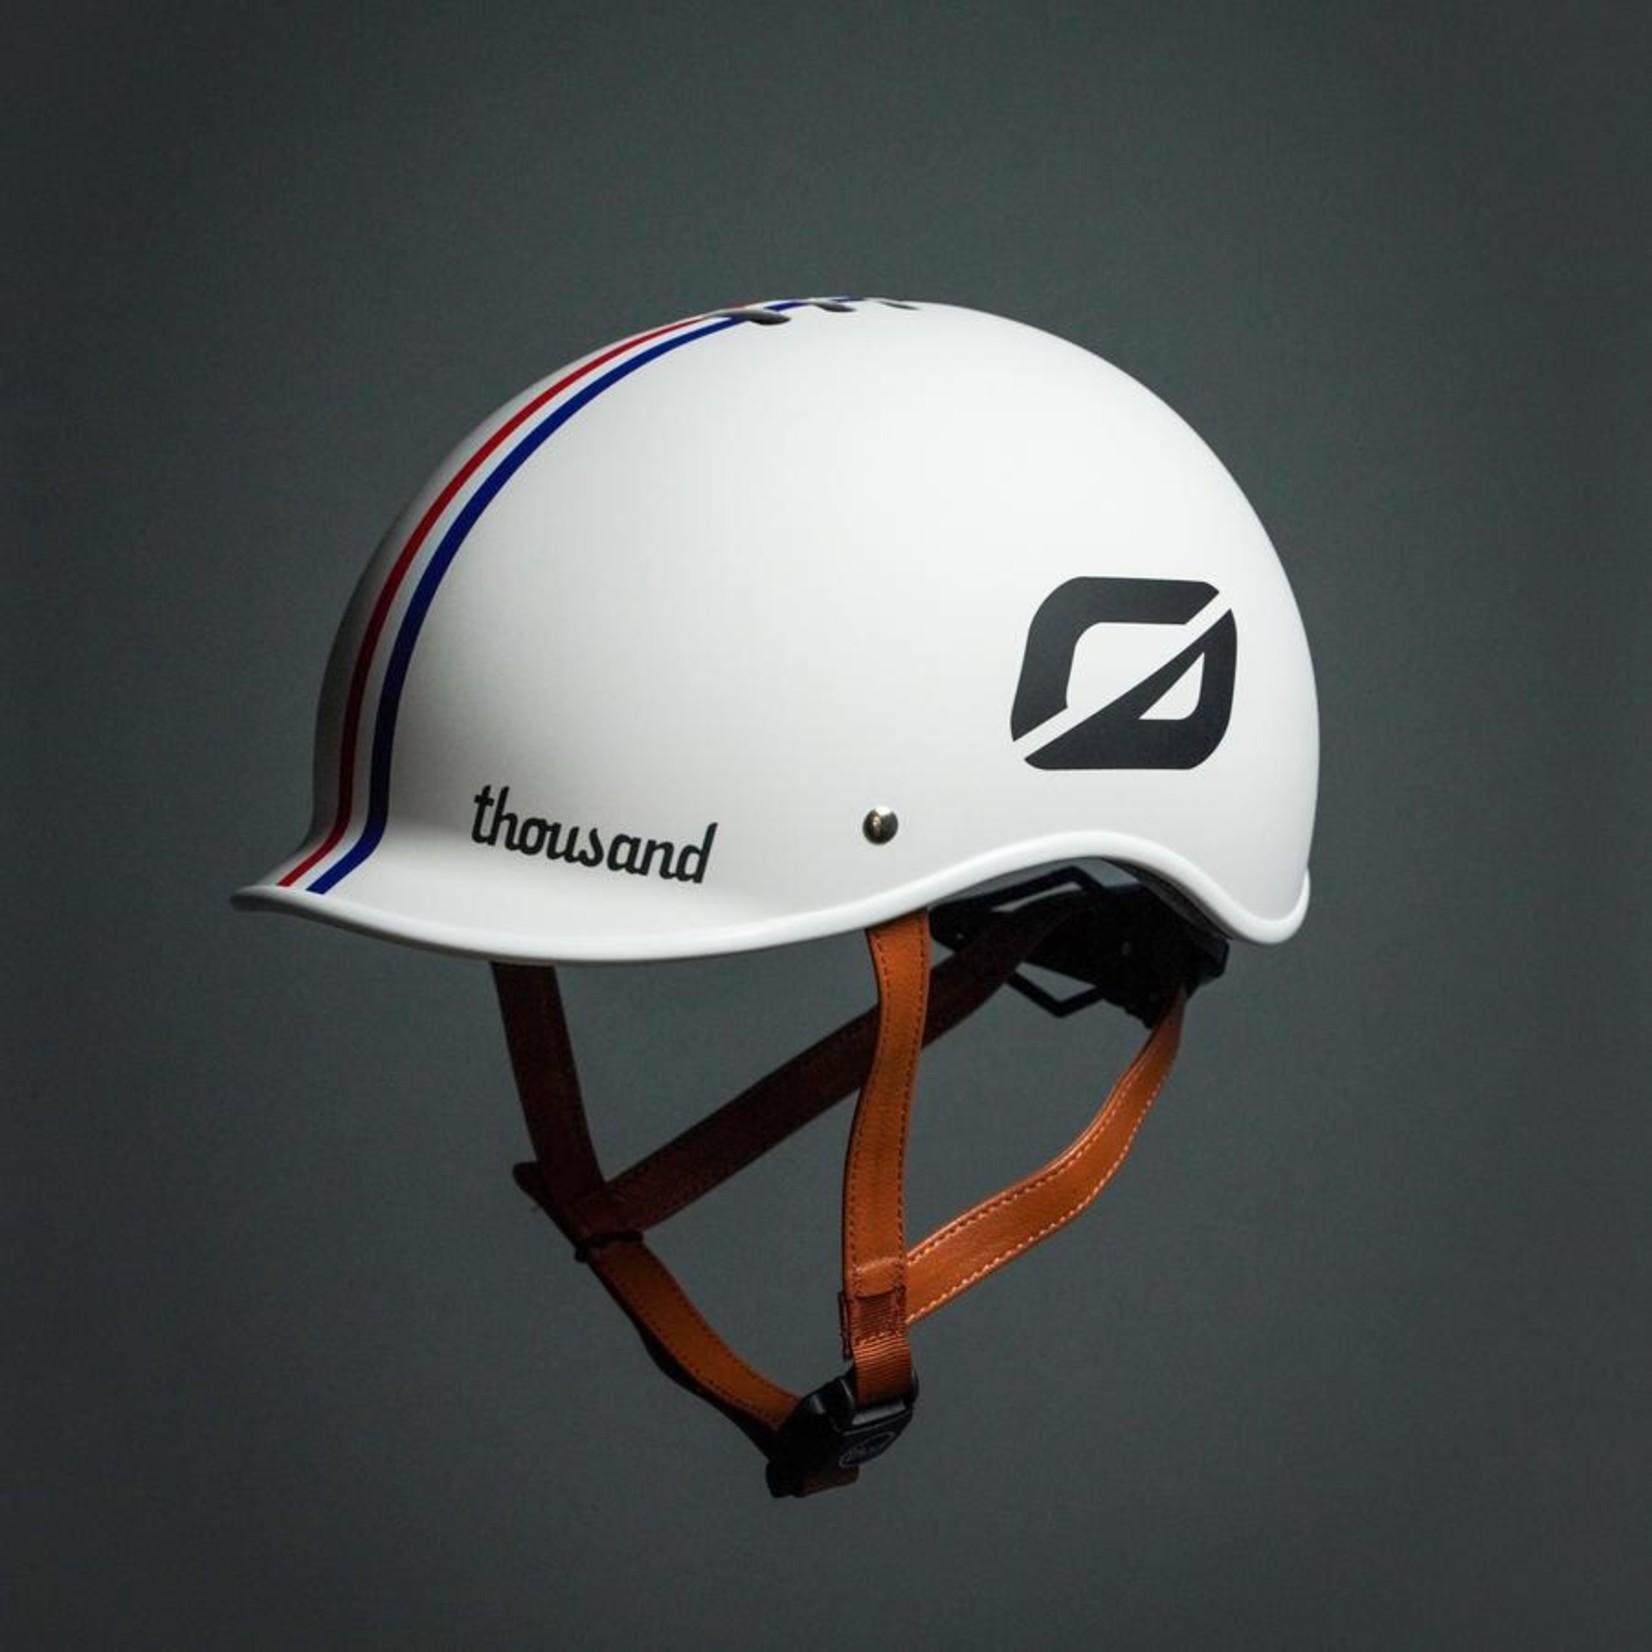 ONEWHEEL ONEWHEEL x Thousand Helmet